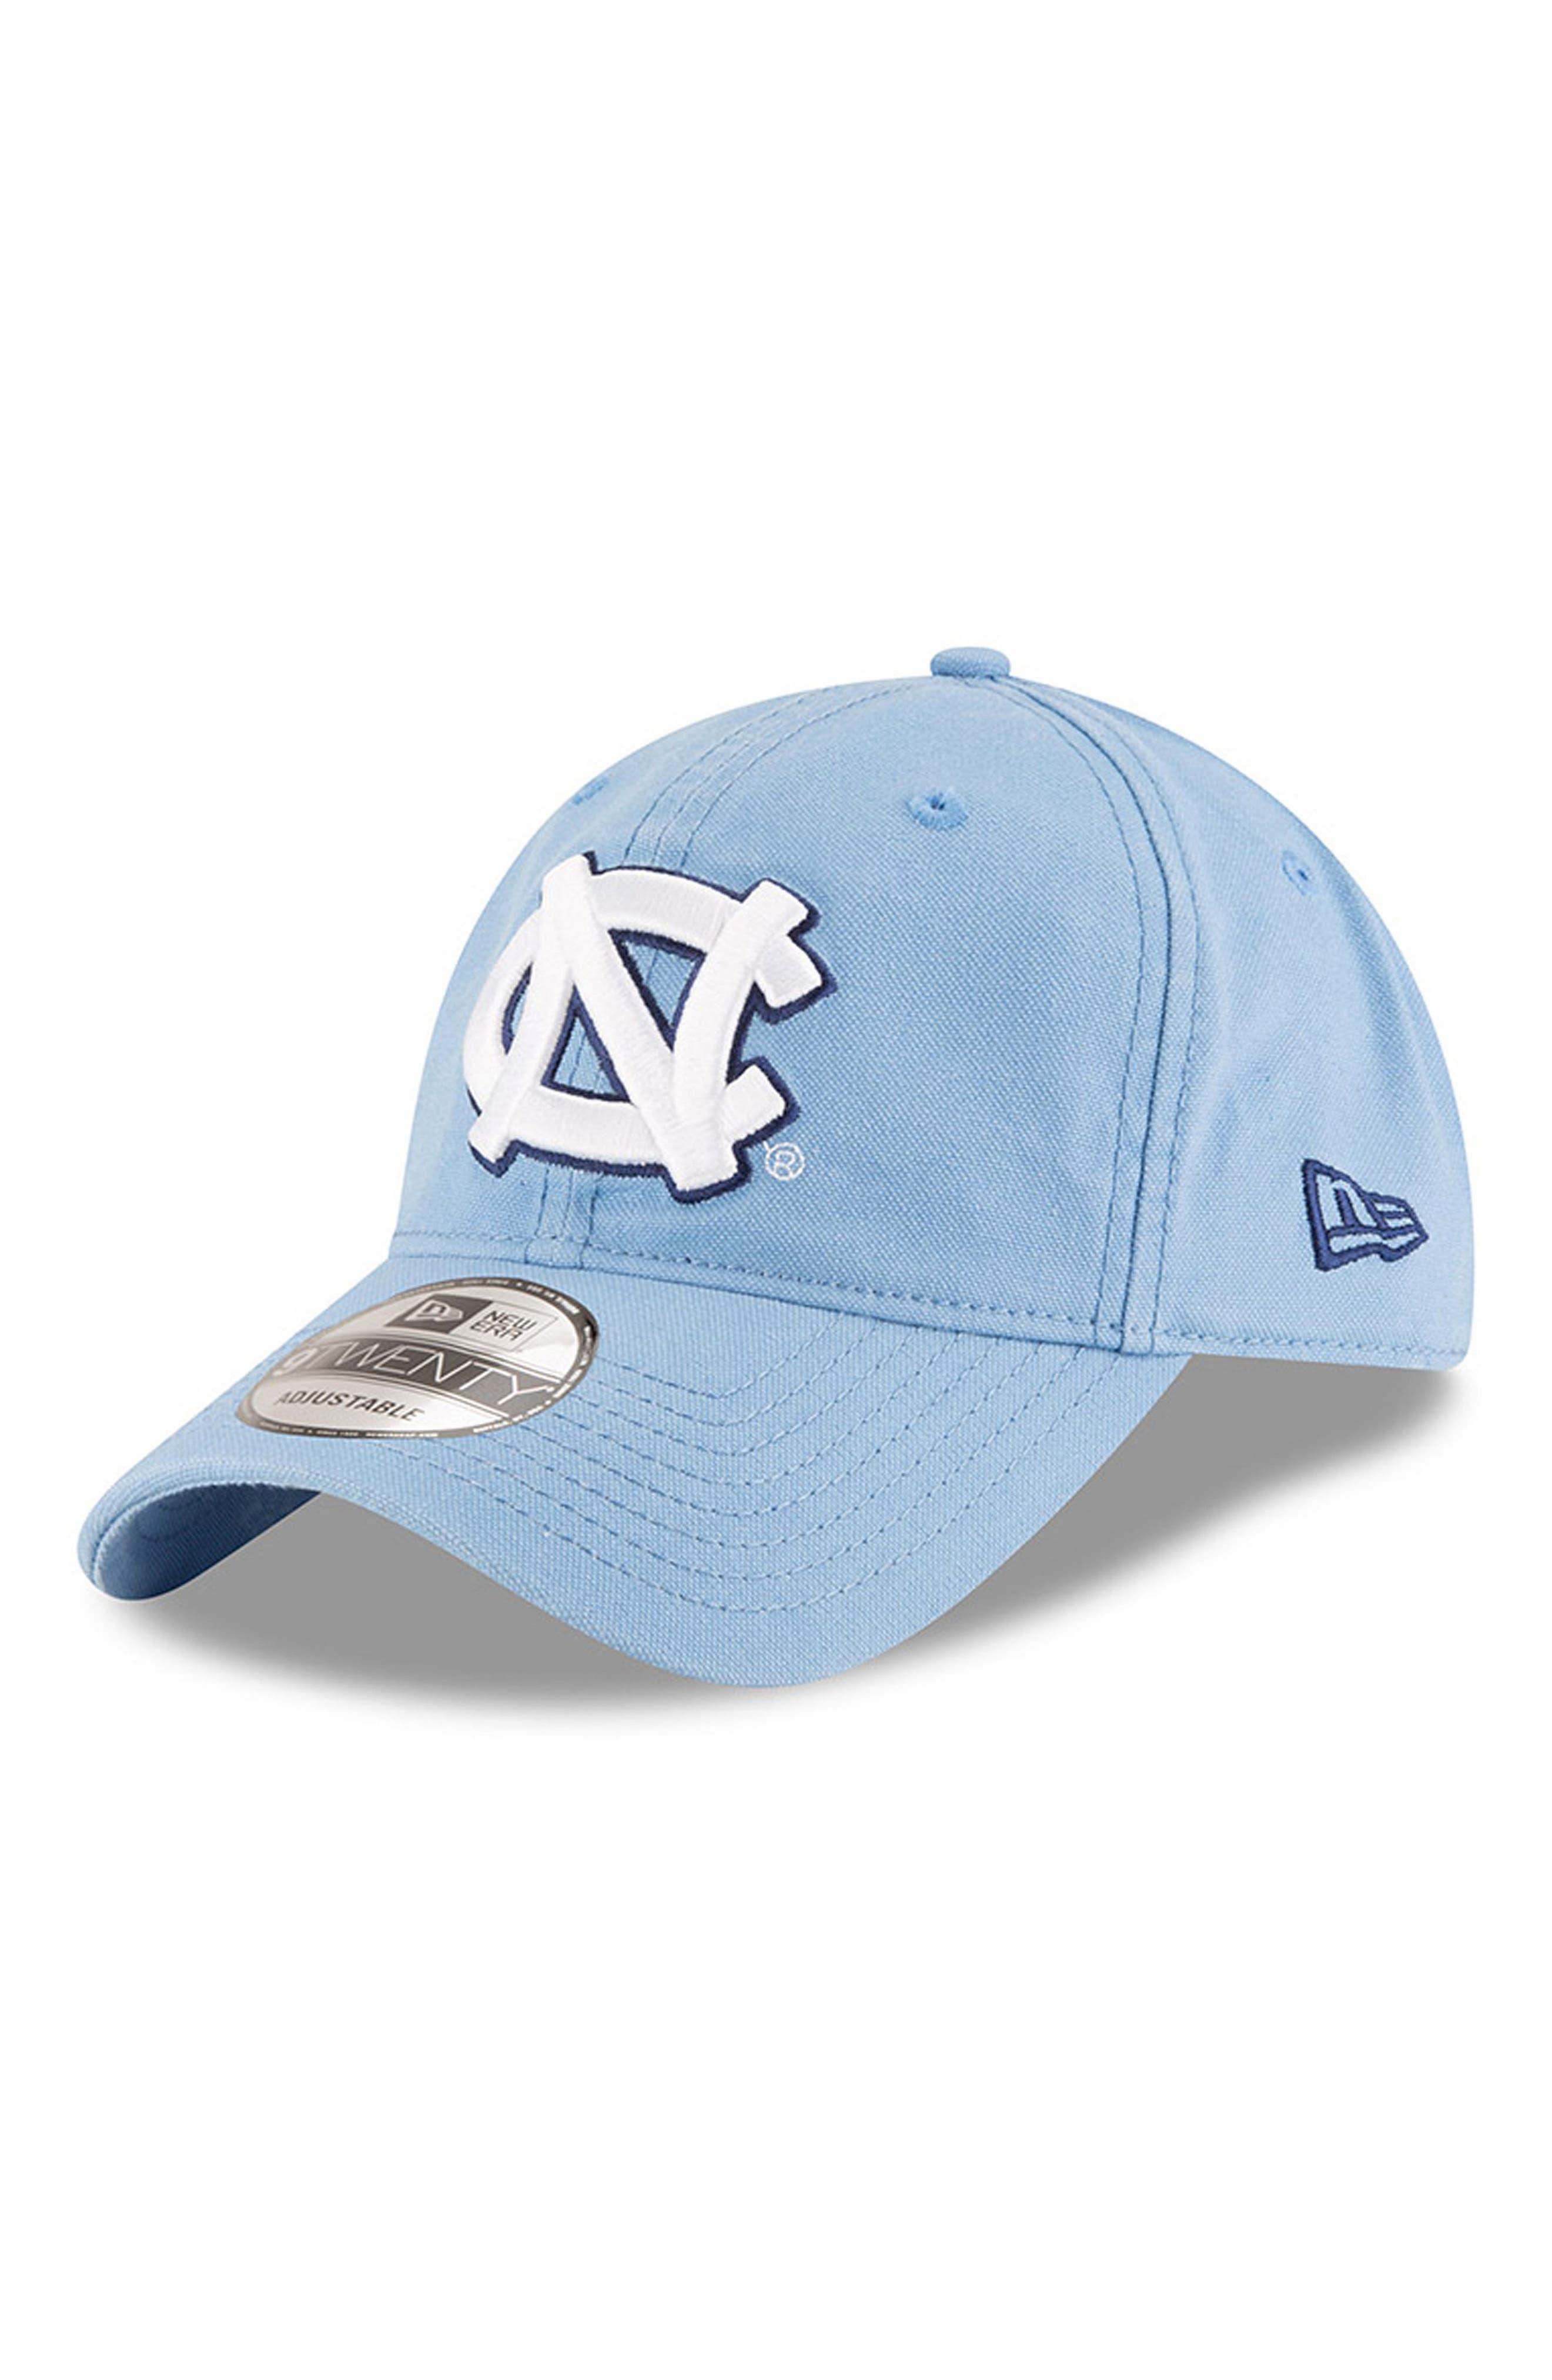 New Era Collegiate Core Classic - North Carolina Tar Heels Baseball Cap,                             Main thumbnail 1, color,                             North Carolina Tar Heels